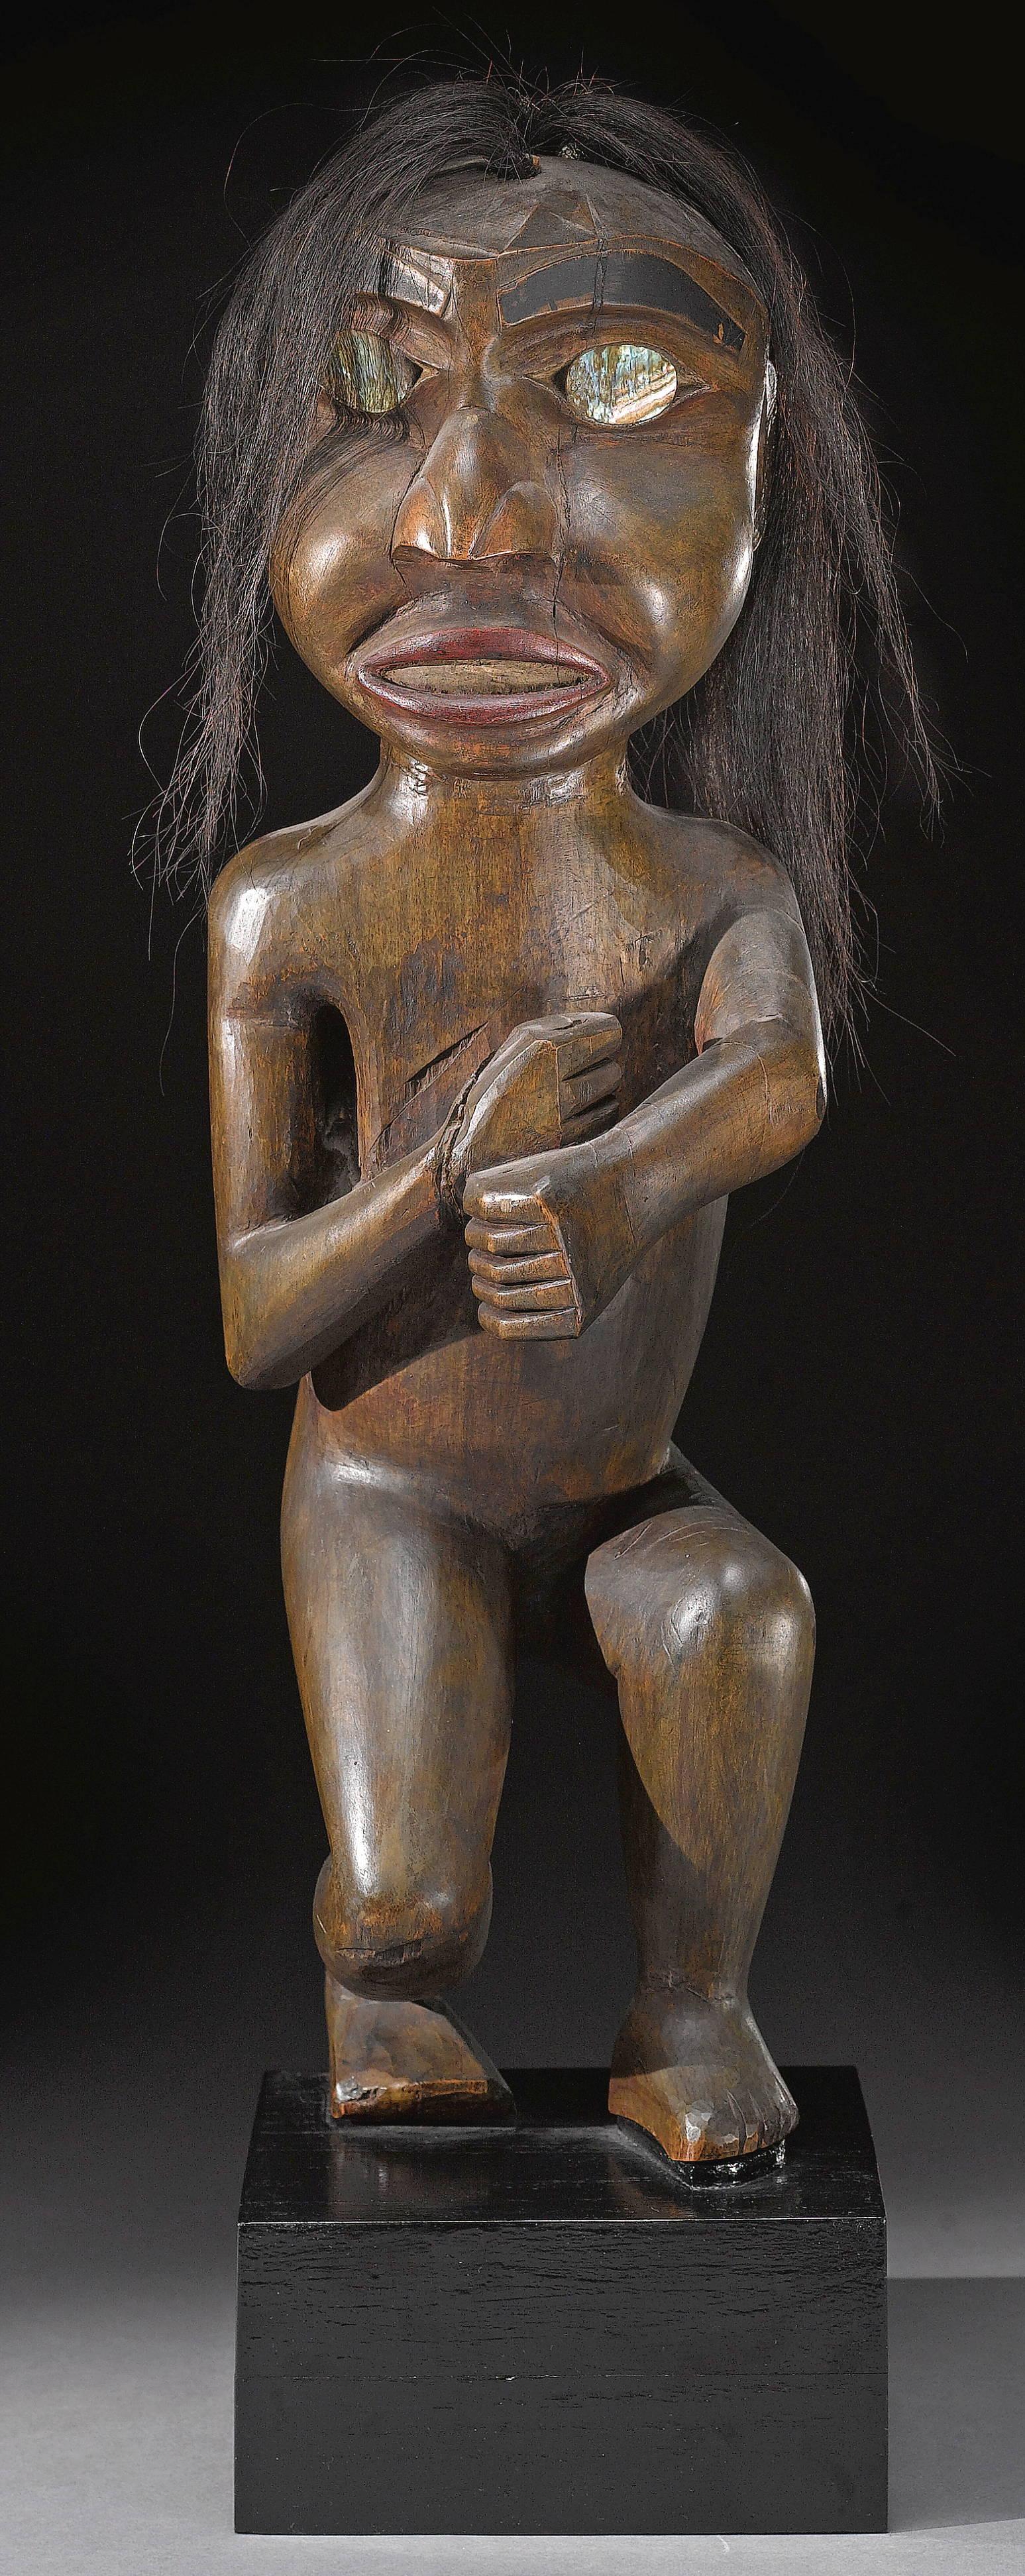 Carved human figure on haida totem pole canada stock photo getty